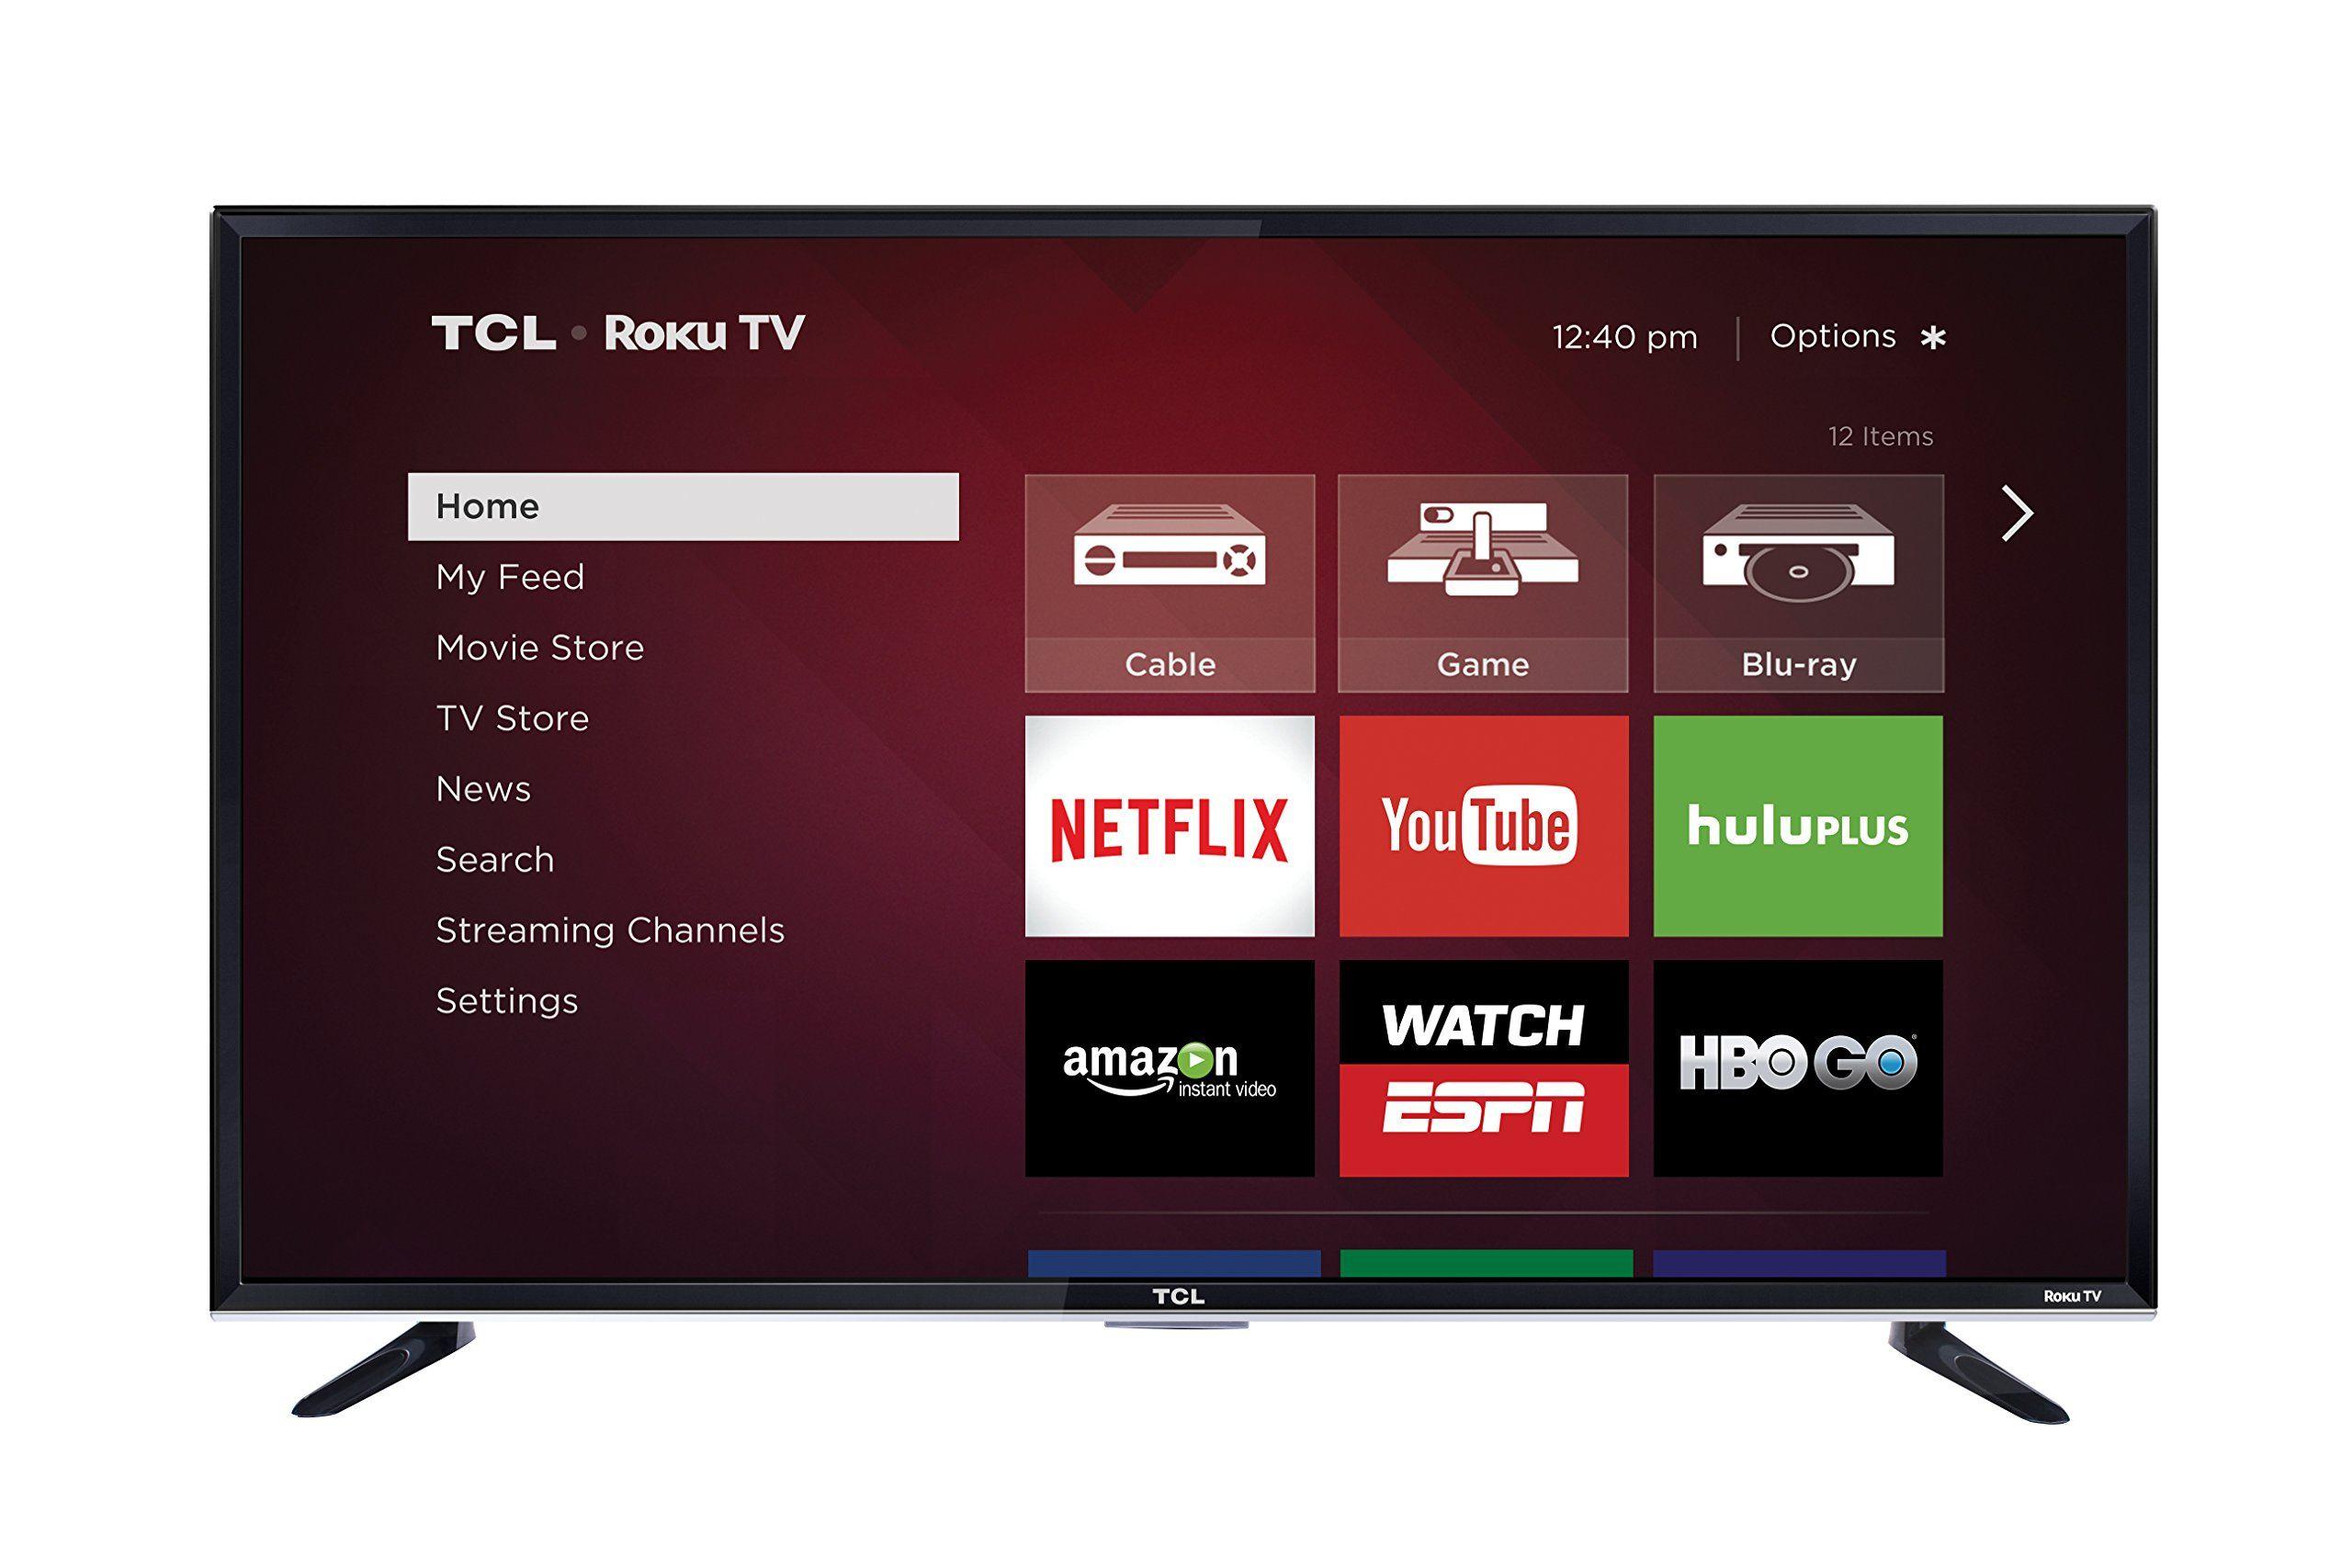 TCL 50FS3800 50Inch 1080p Roku Smart LED TV (2015 Model